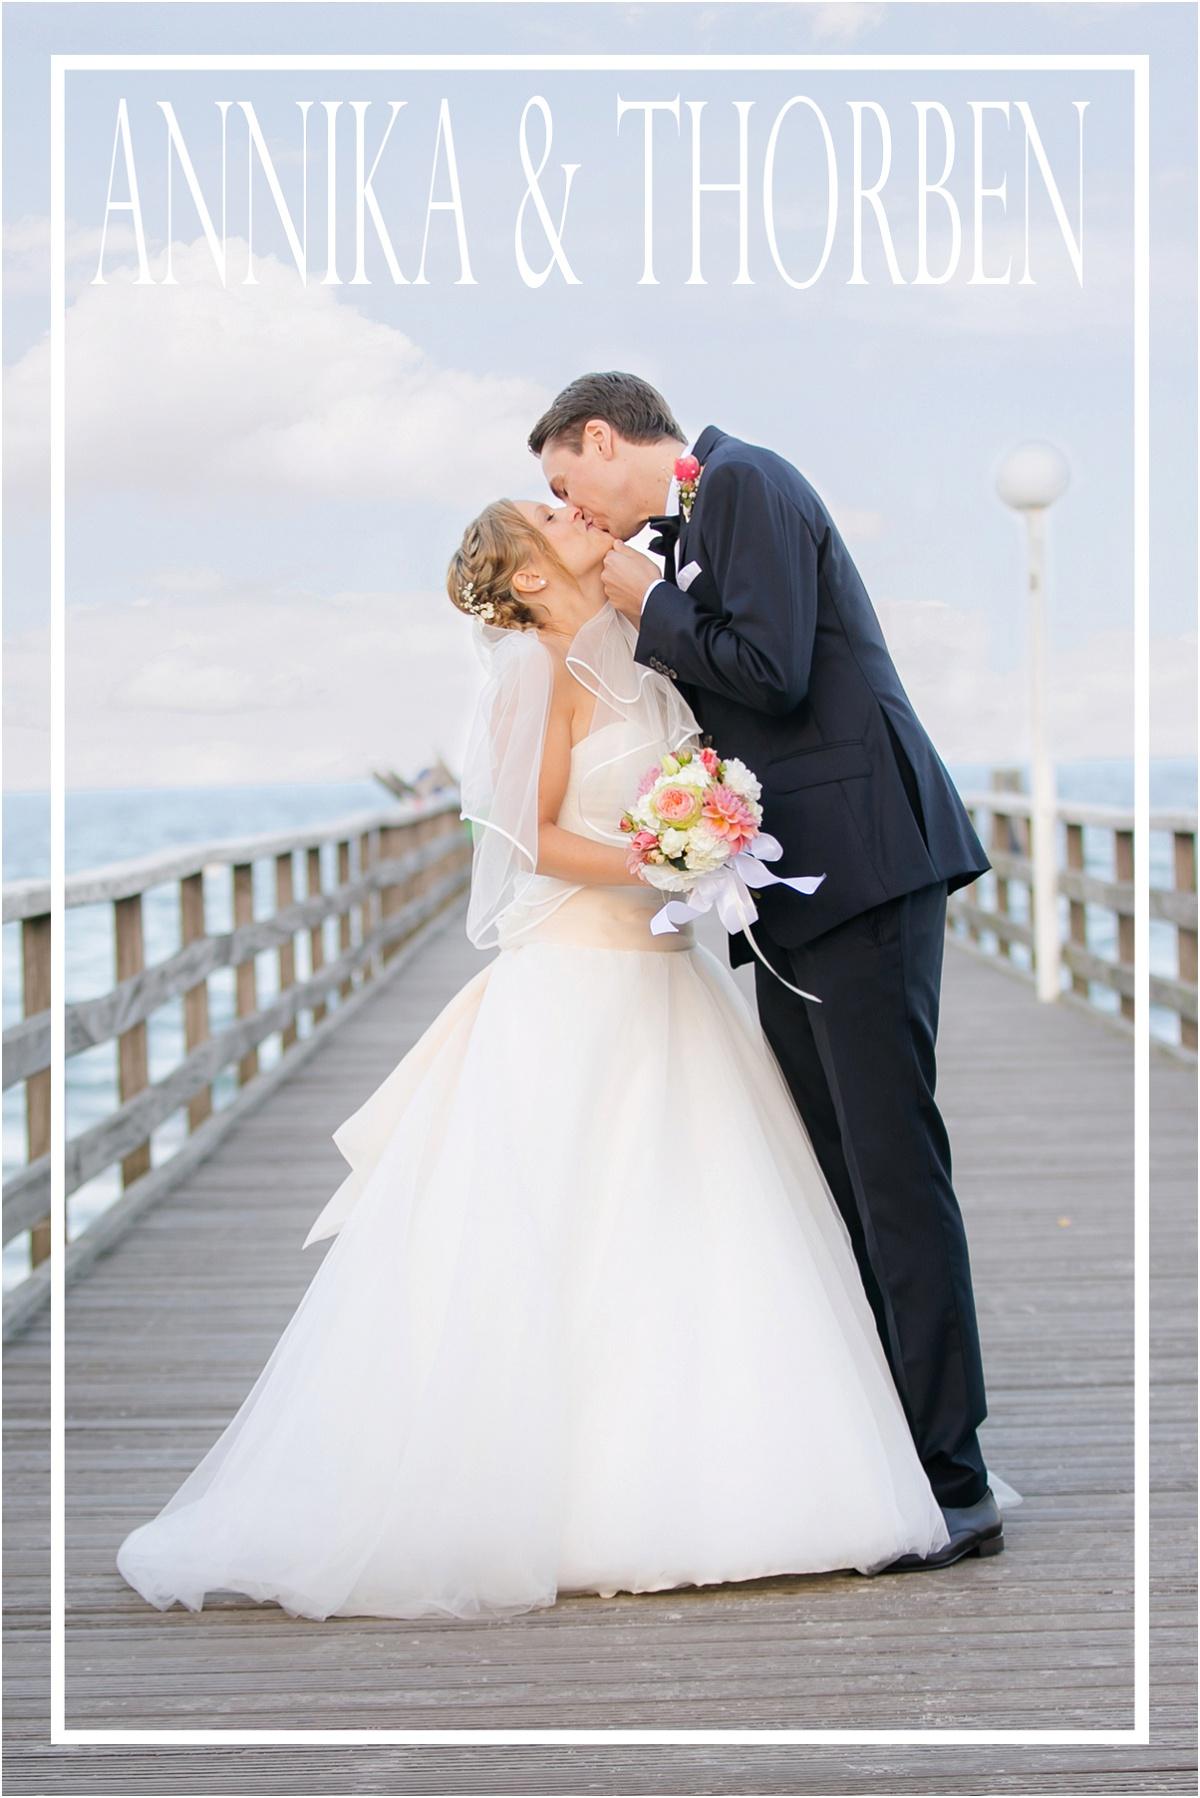 Terra Cooper Photography Weddings Brides 2015_5380.jpg